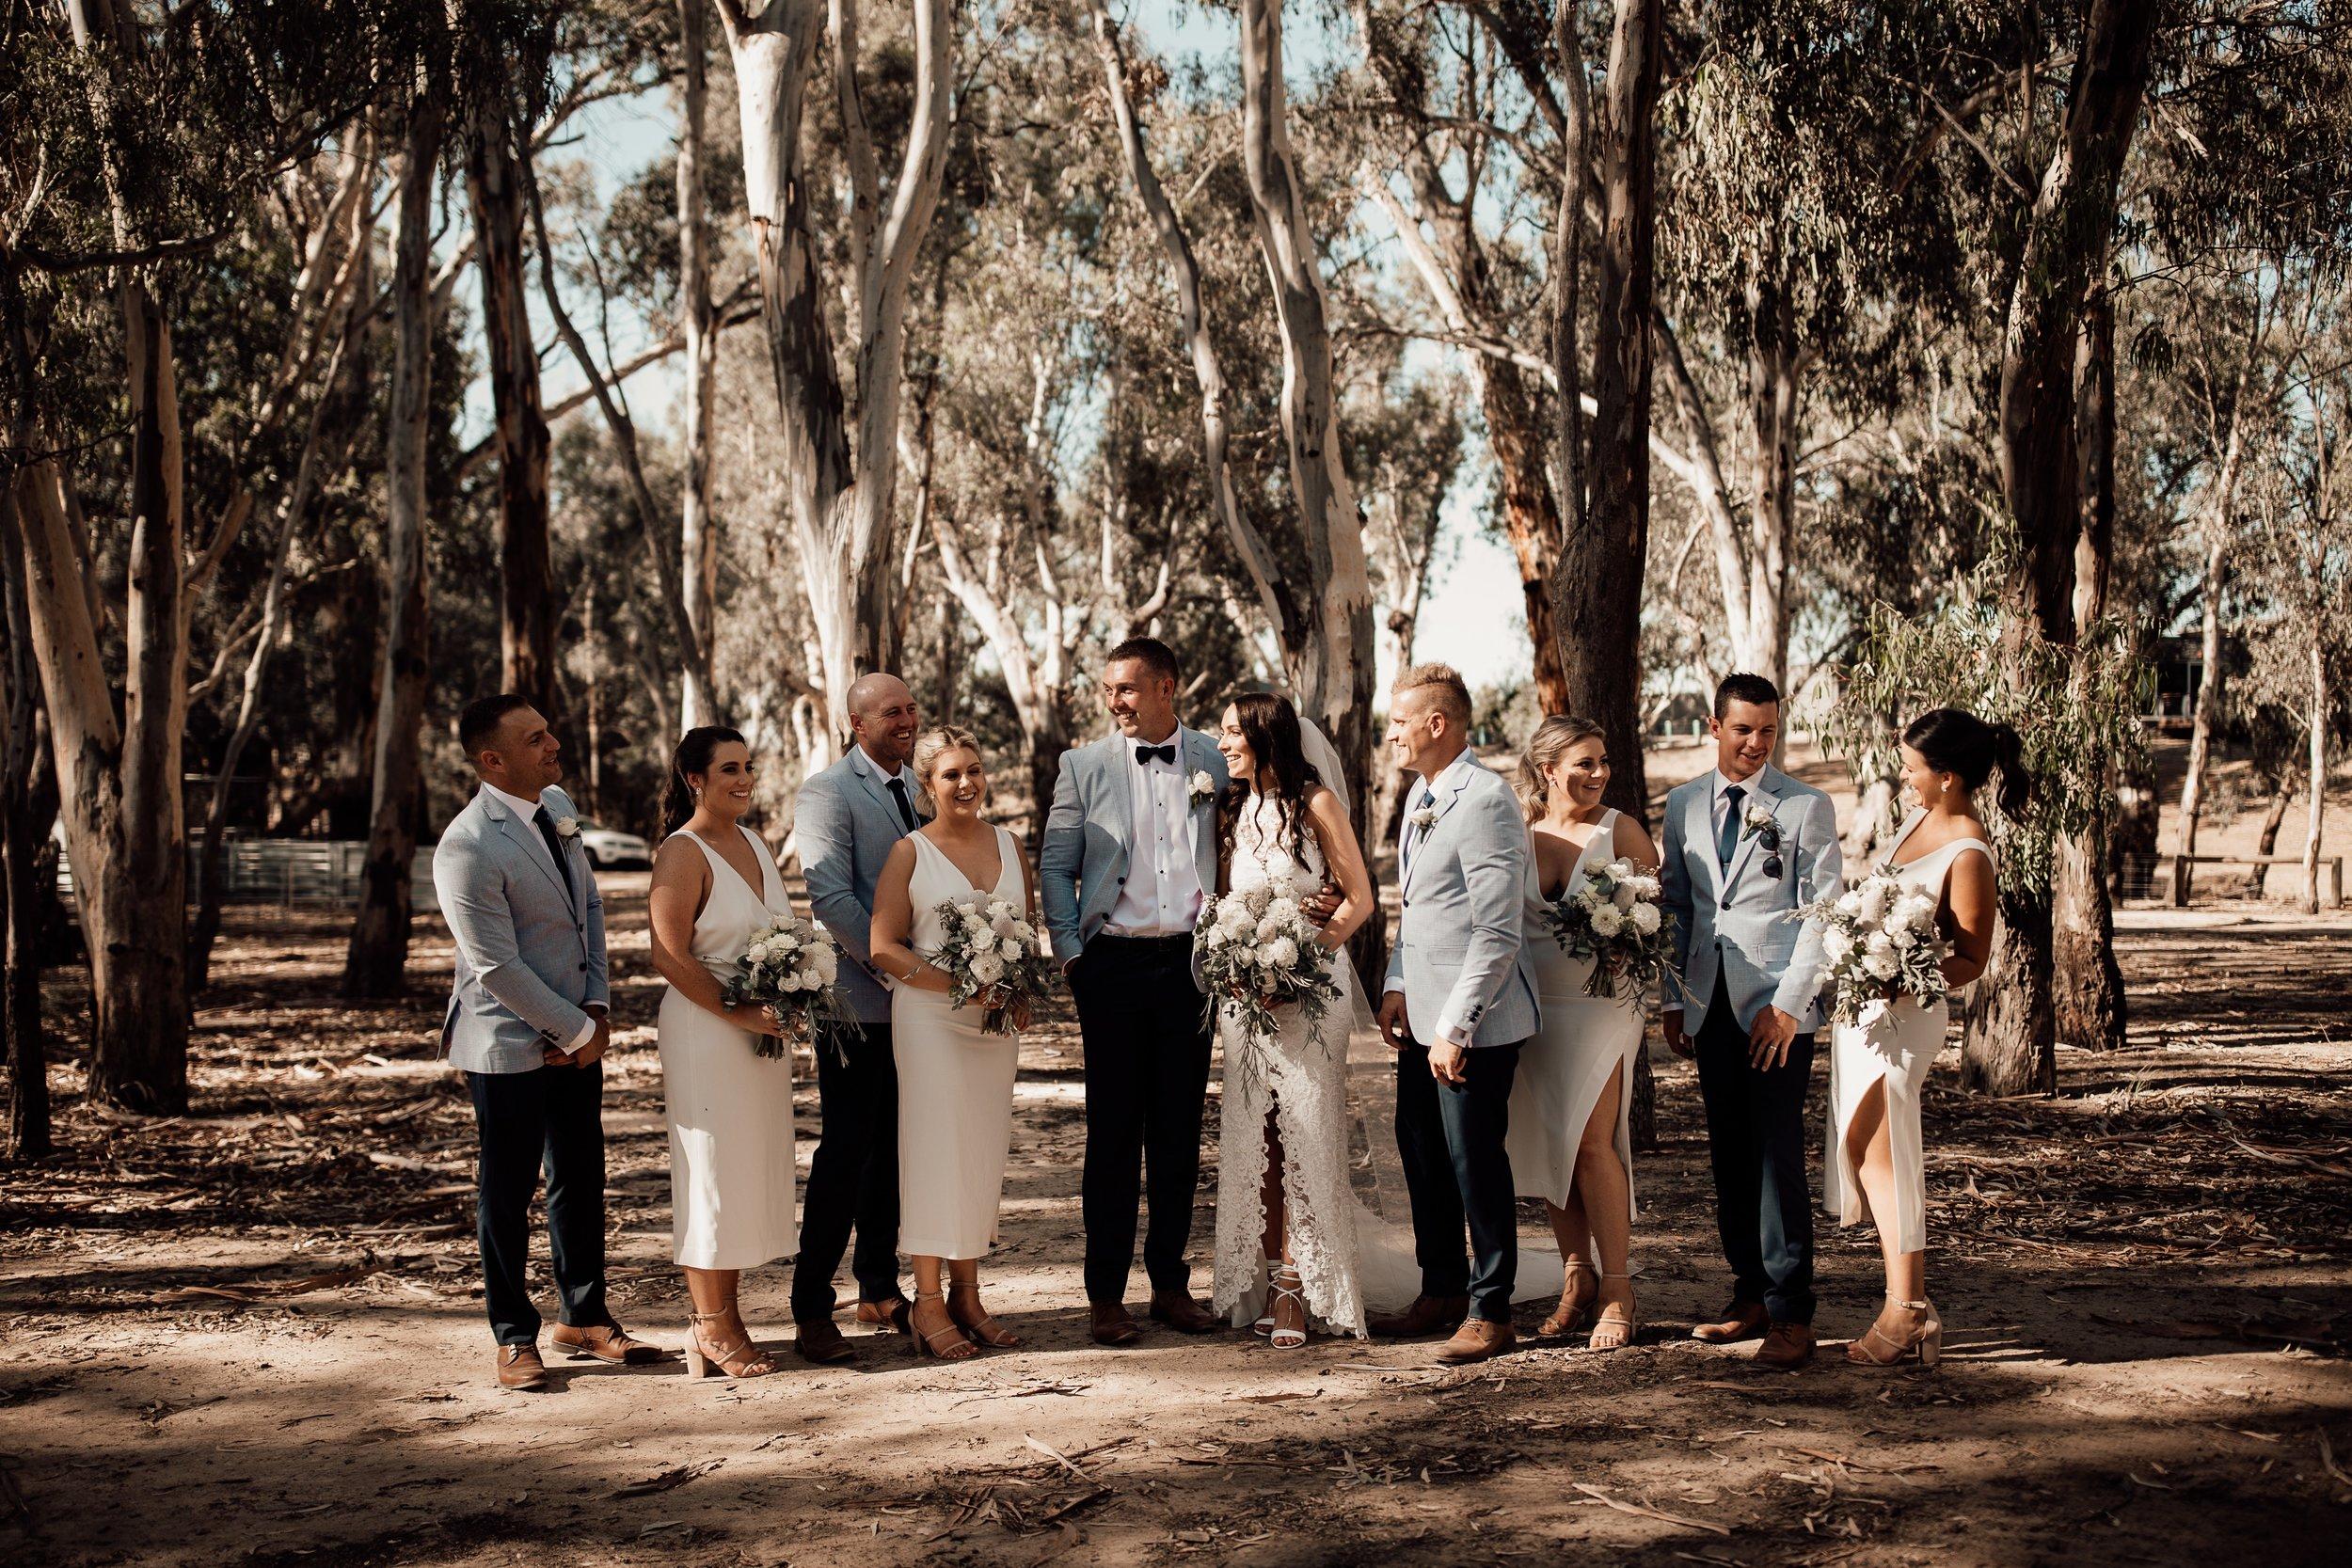 mickalathomas_puremacphotography_weddingphotographer_couplephotographer_Sheppartonphotographer_2902.jpg